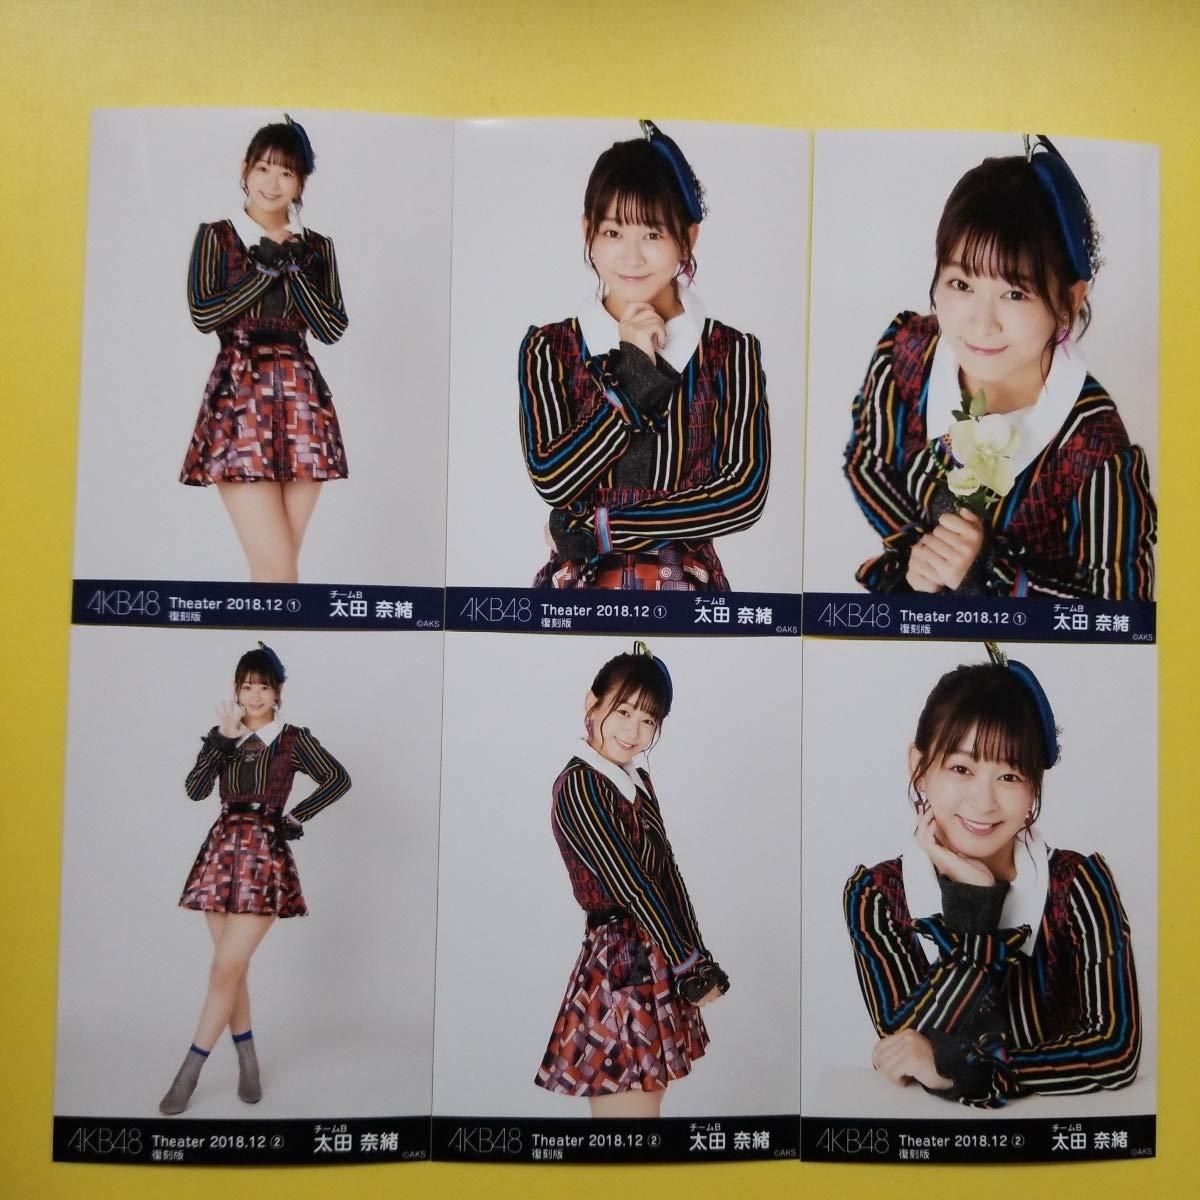 【国産】 復刻版 AKB48 チーム8 太田奈緒 B07QGR6SCM 当選品 月別生写真 2018 AKB48 12月 December ①+② 6種コンプ 2019 福袋 当選品 B07QGR6SCM, 超音波と魚探のus-dolphin:f9f82d5d --- a0267596.xsph.ru